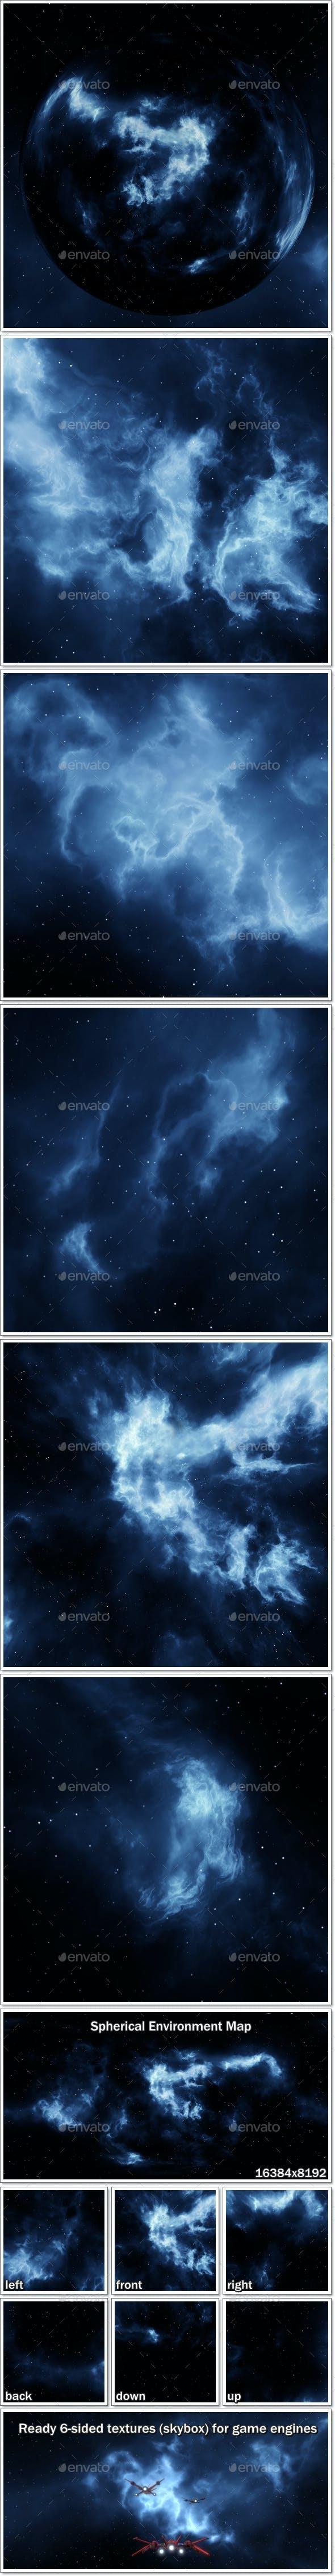 Nebula Space Environment HDRI Map 008 - 3DOcean Item for Sale